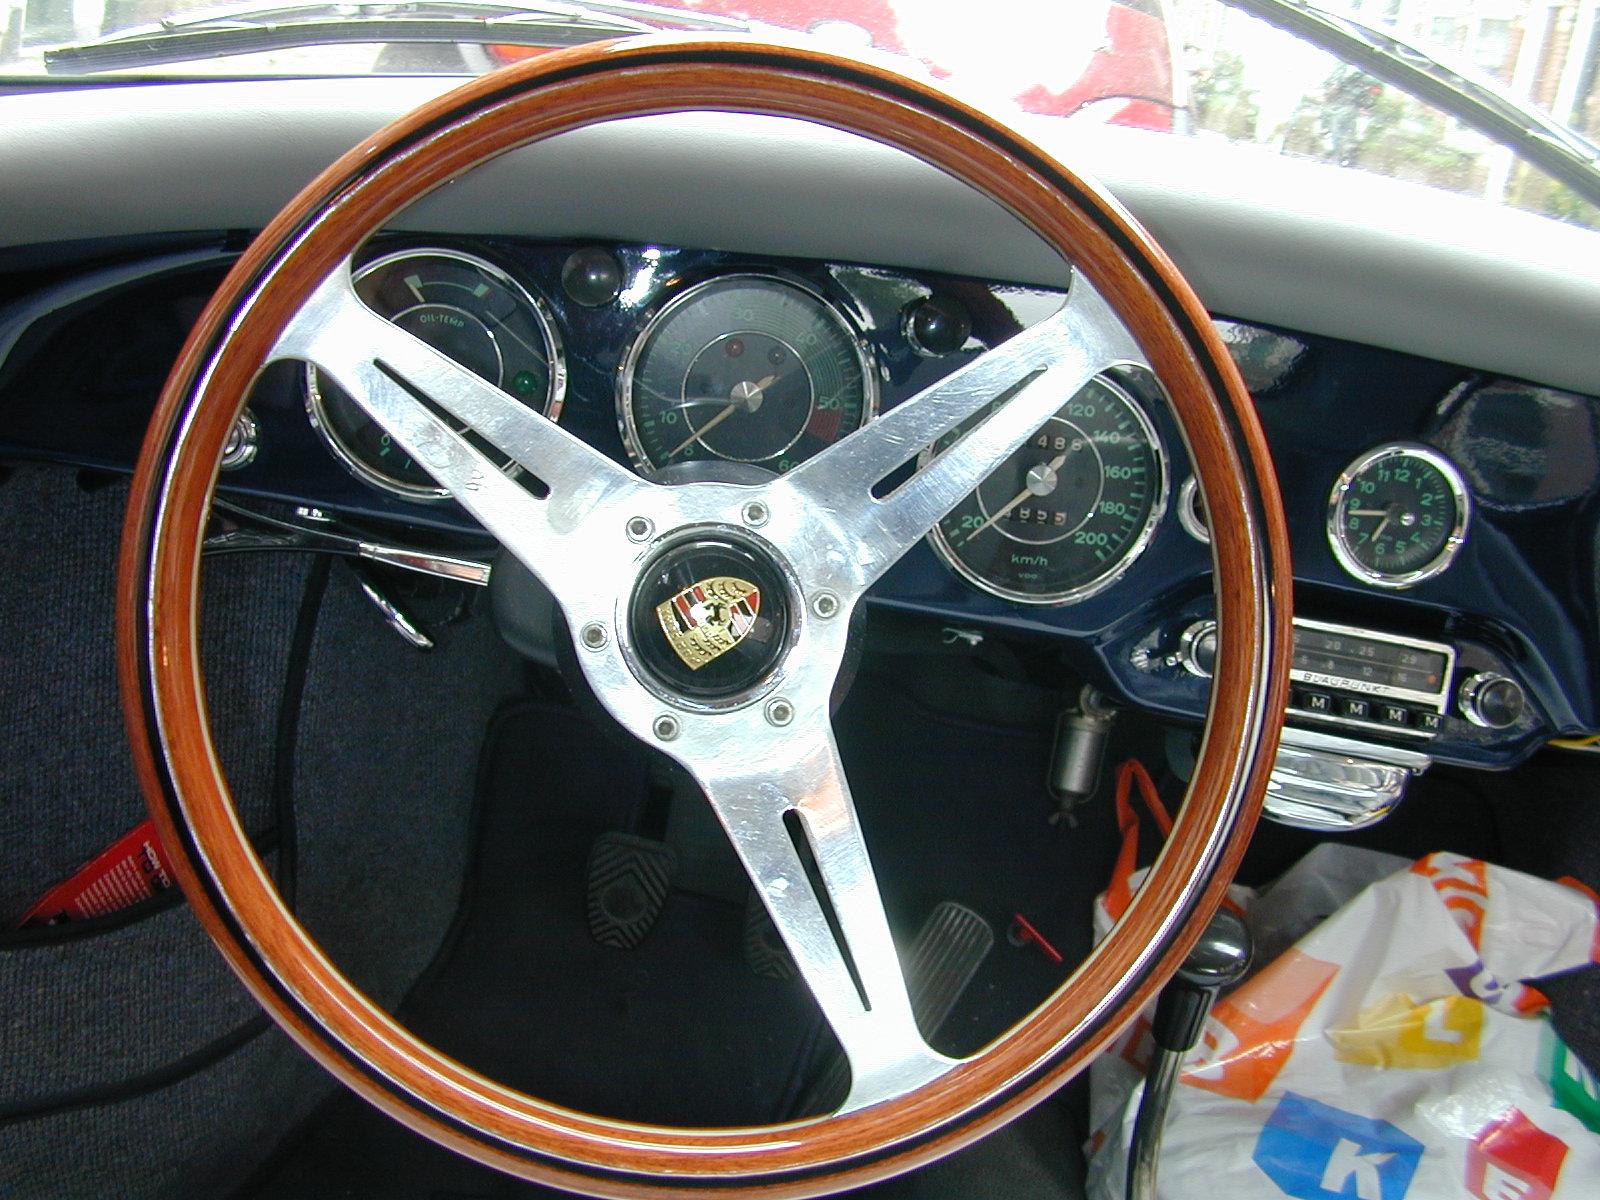 steer steering ferrari dashboard interiors car vehicles land antique gauges circle